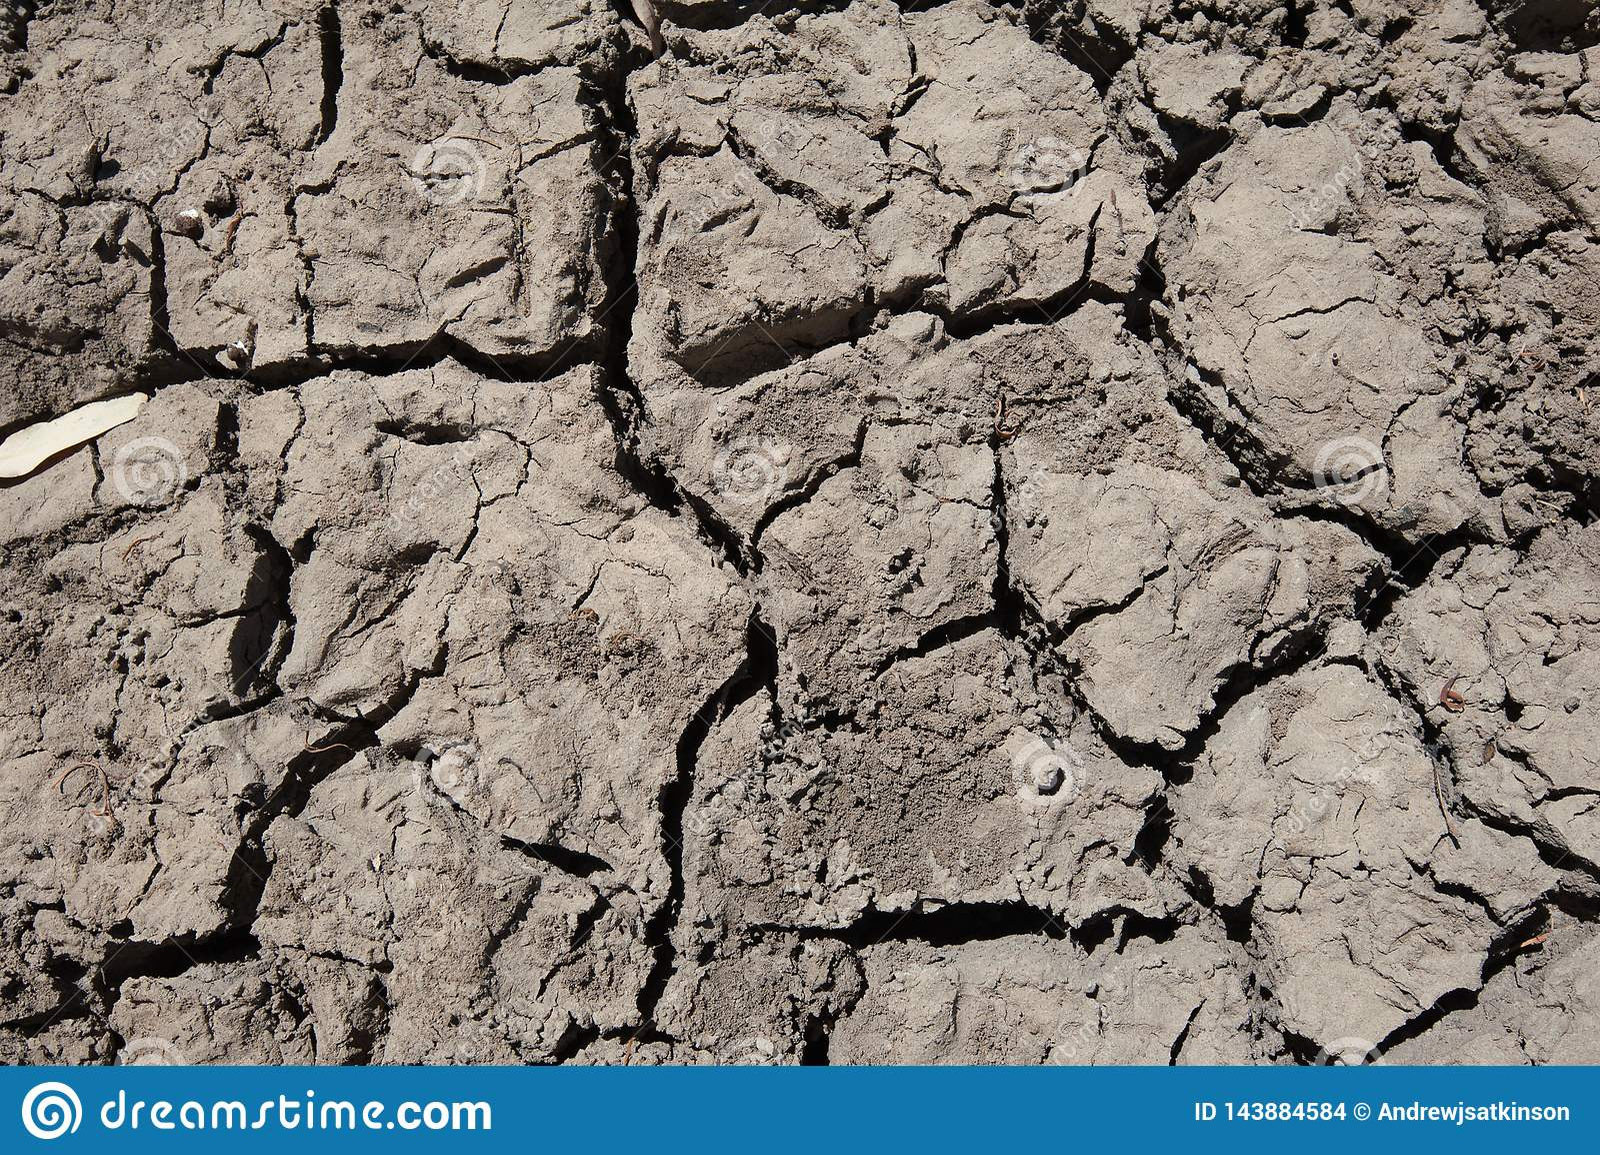 Droog gebarsten modder vormt patroon